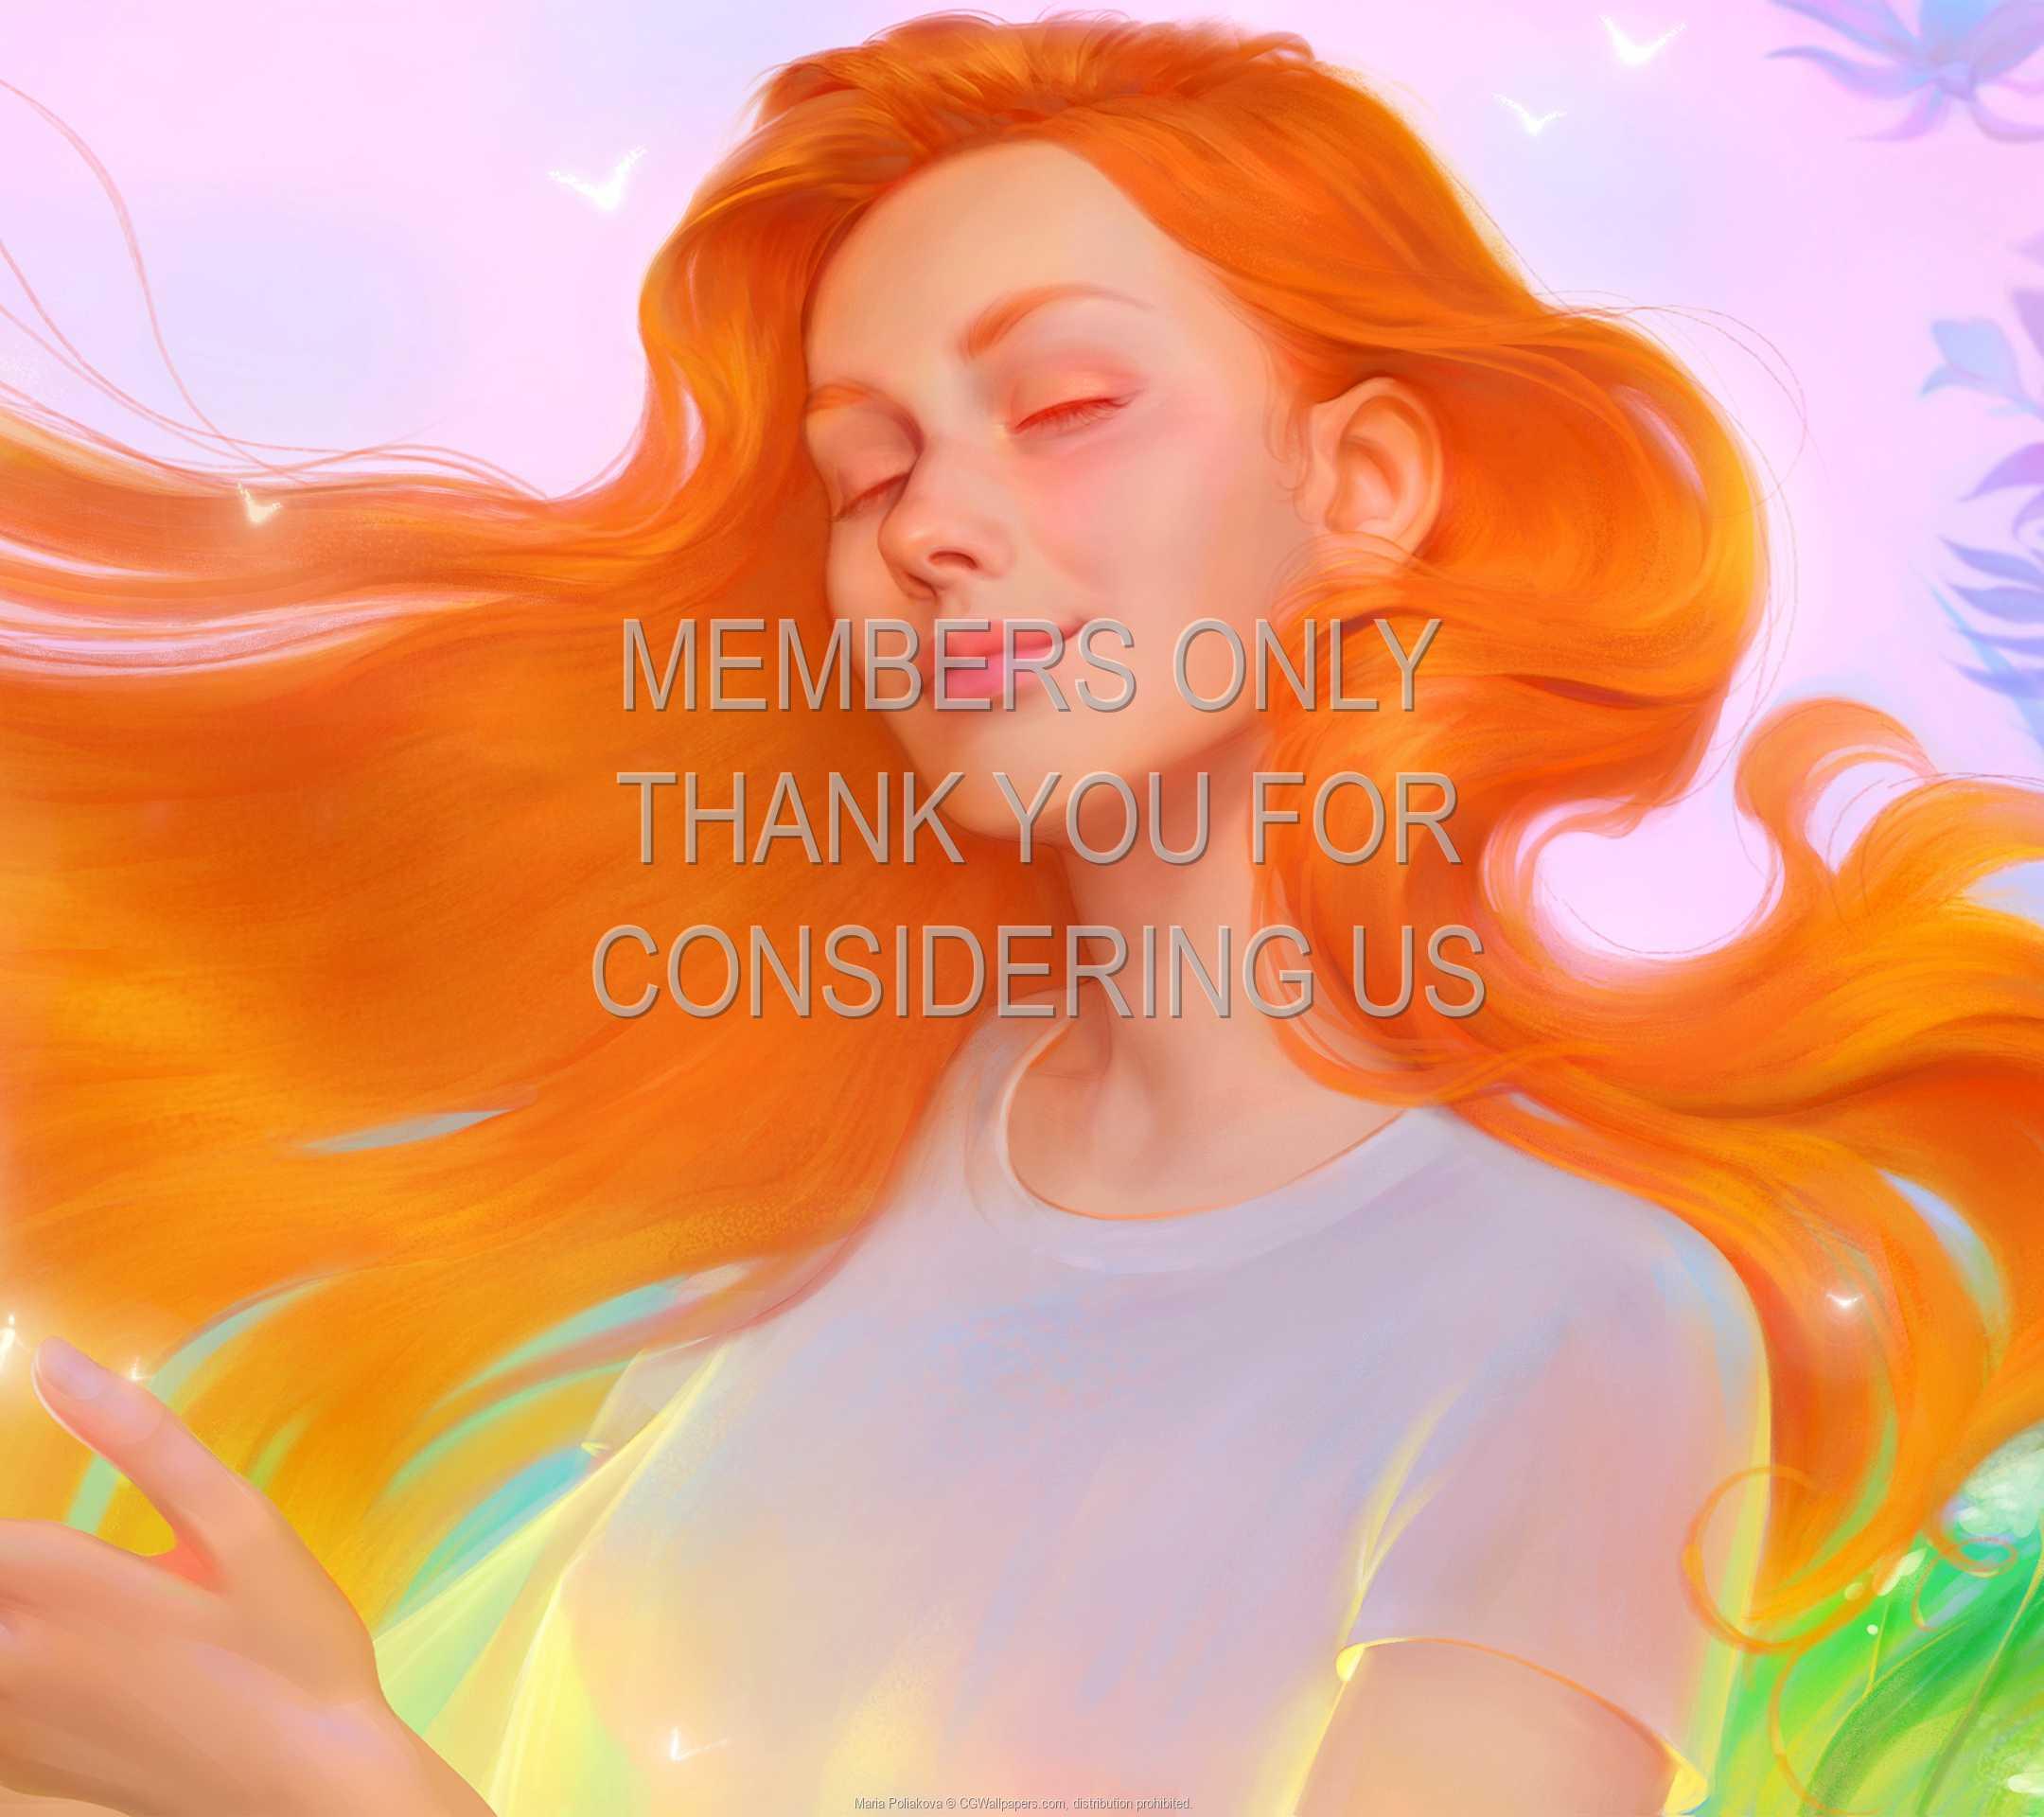 Maria Poliakova 1080p Horizontal Mobile fond d'écran 03